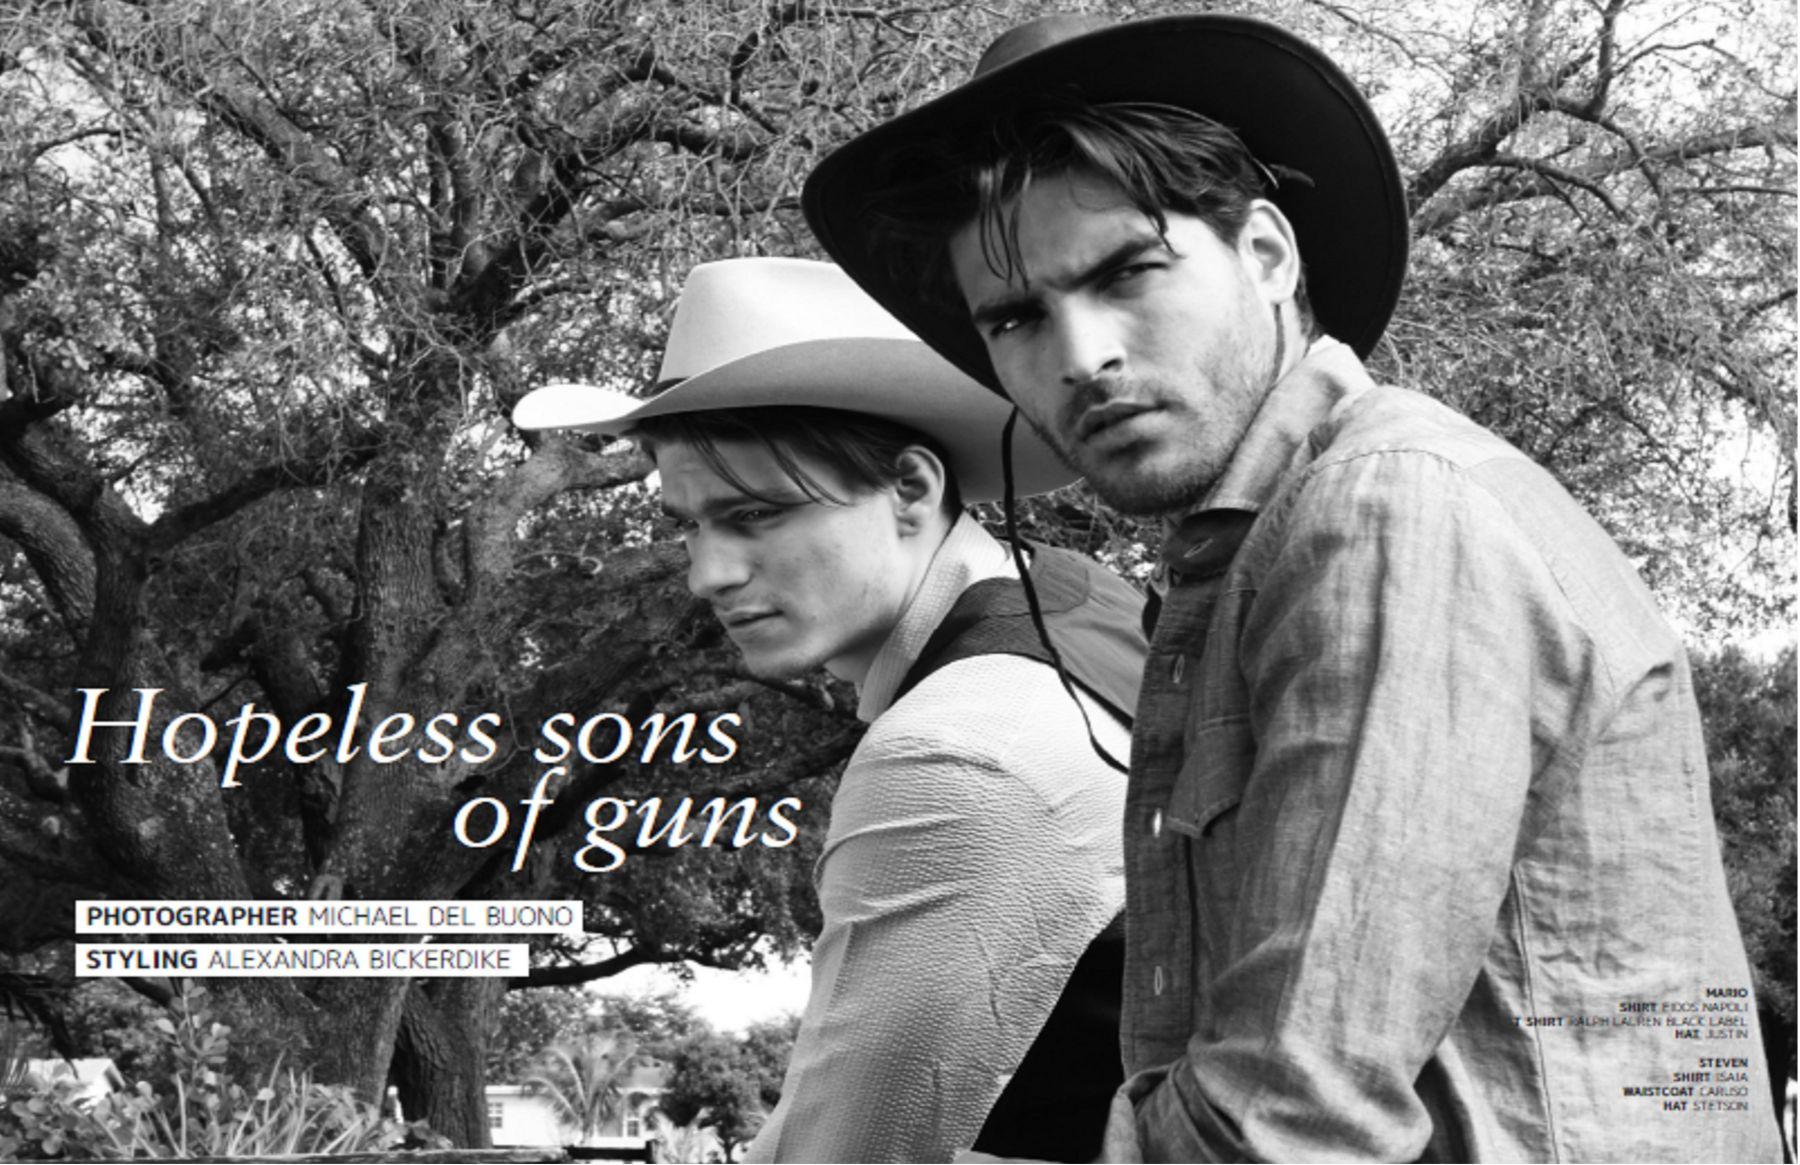 HOPLE SONS OF GUNS for JON MAGAZINE LONDON by MICHAEL DEL BUONO